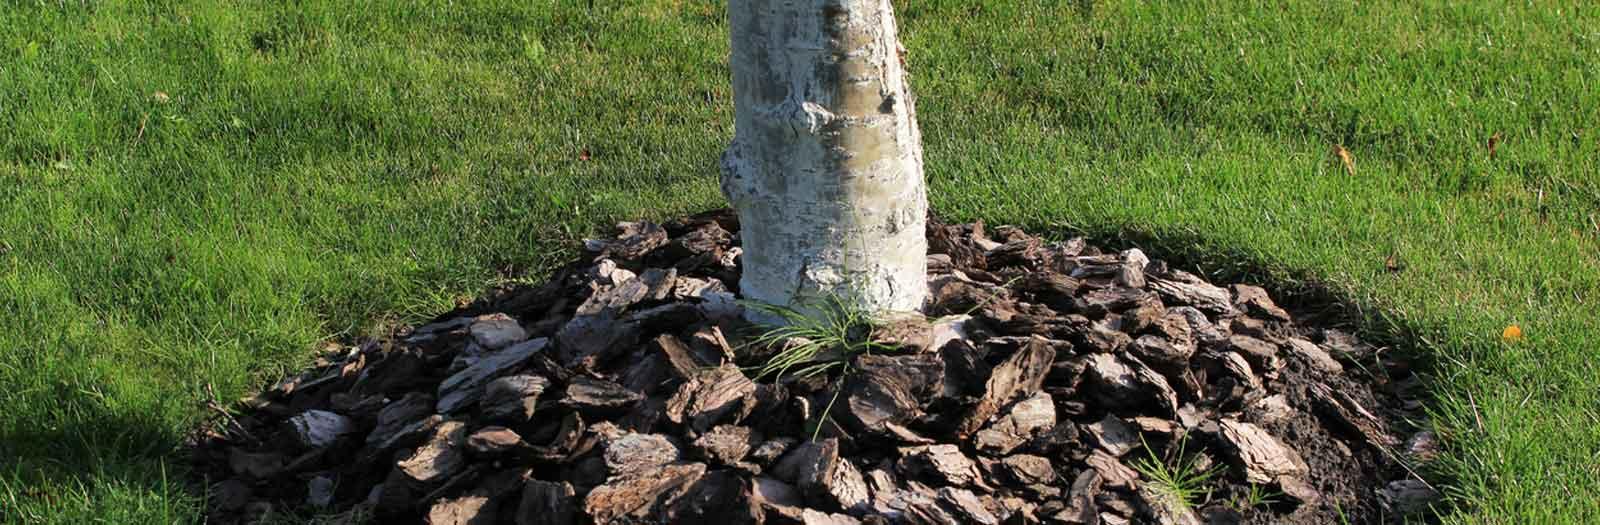 tree showing mulch surrounding the base